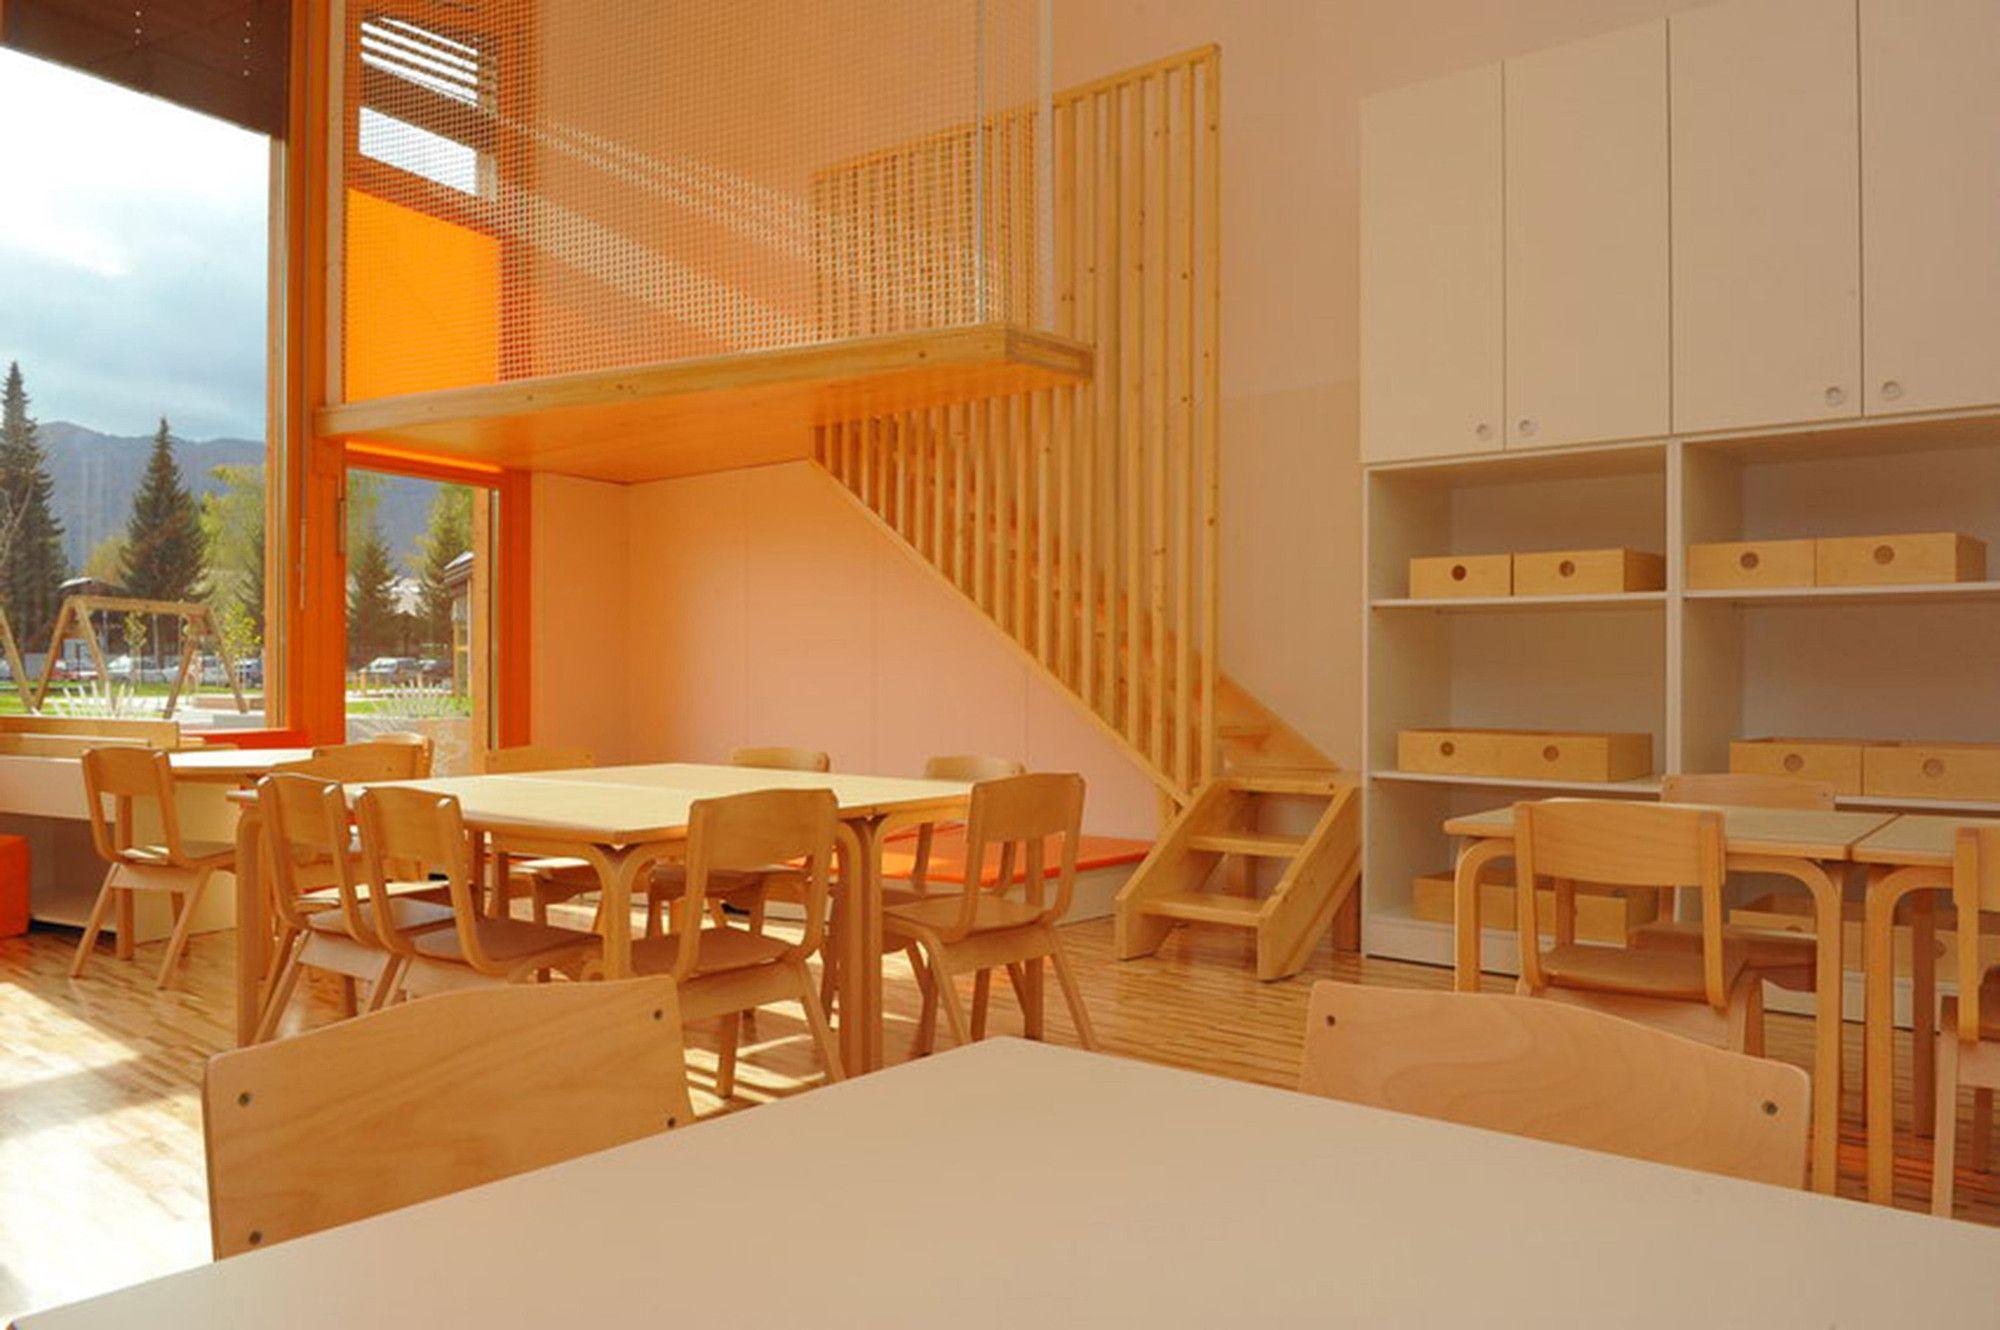 Gallery of Kindergarten in Ribnica / ARHI-TURA d.o.o - 4